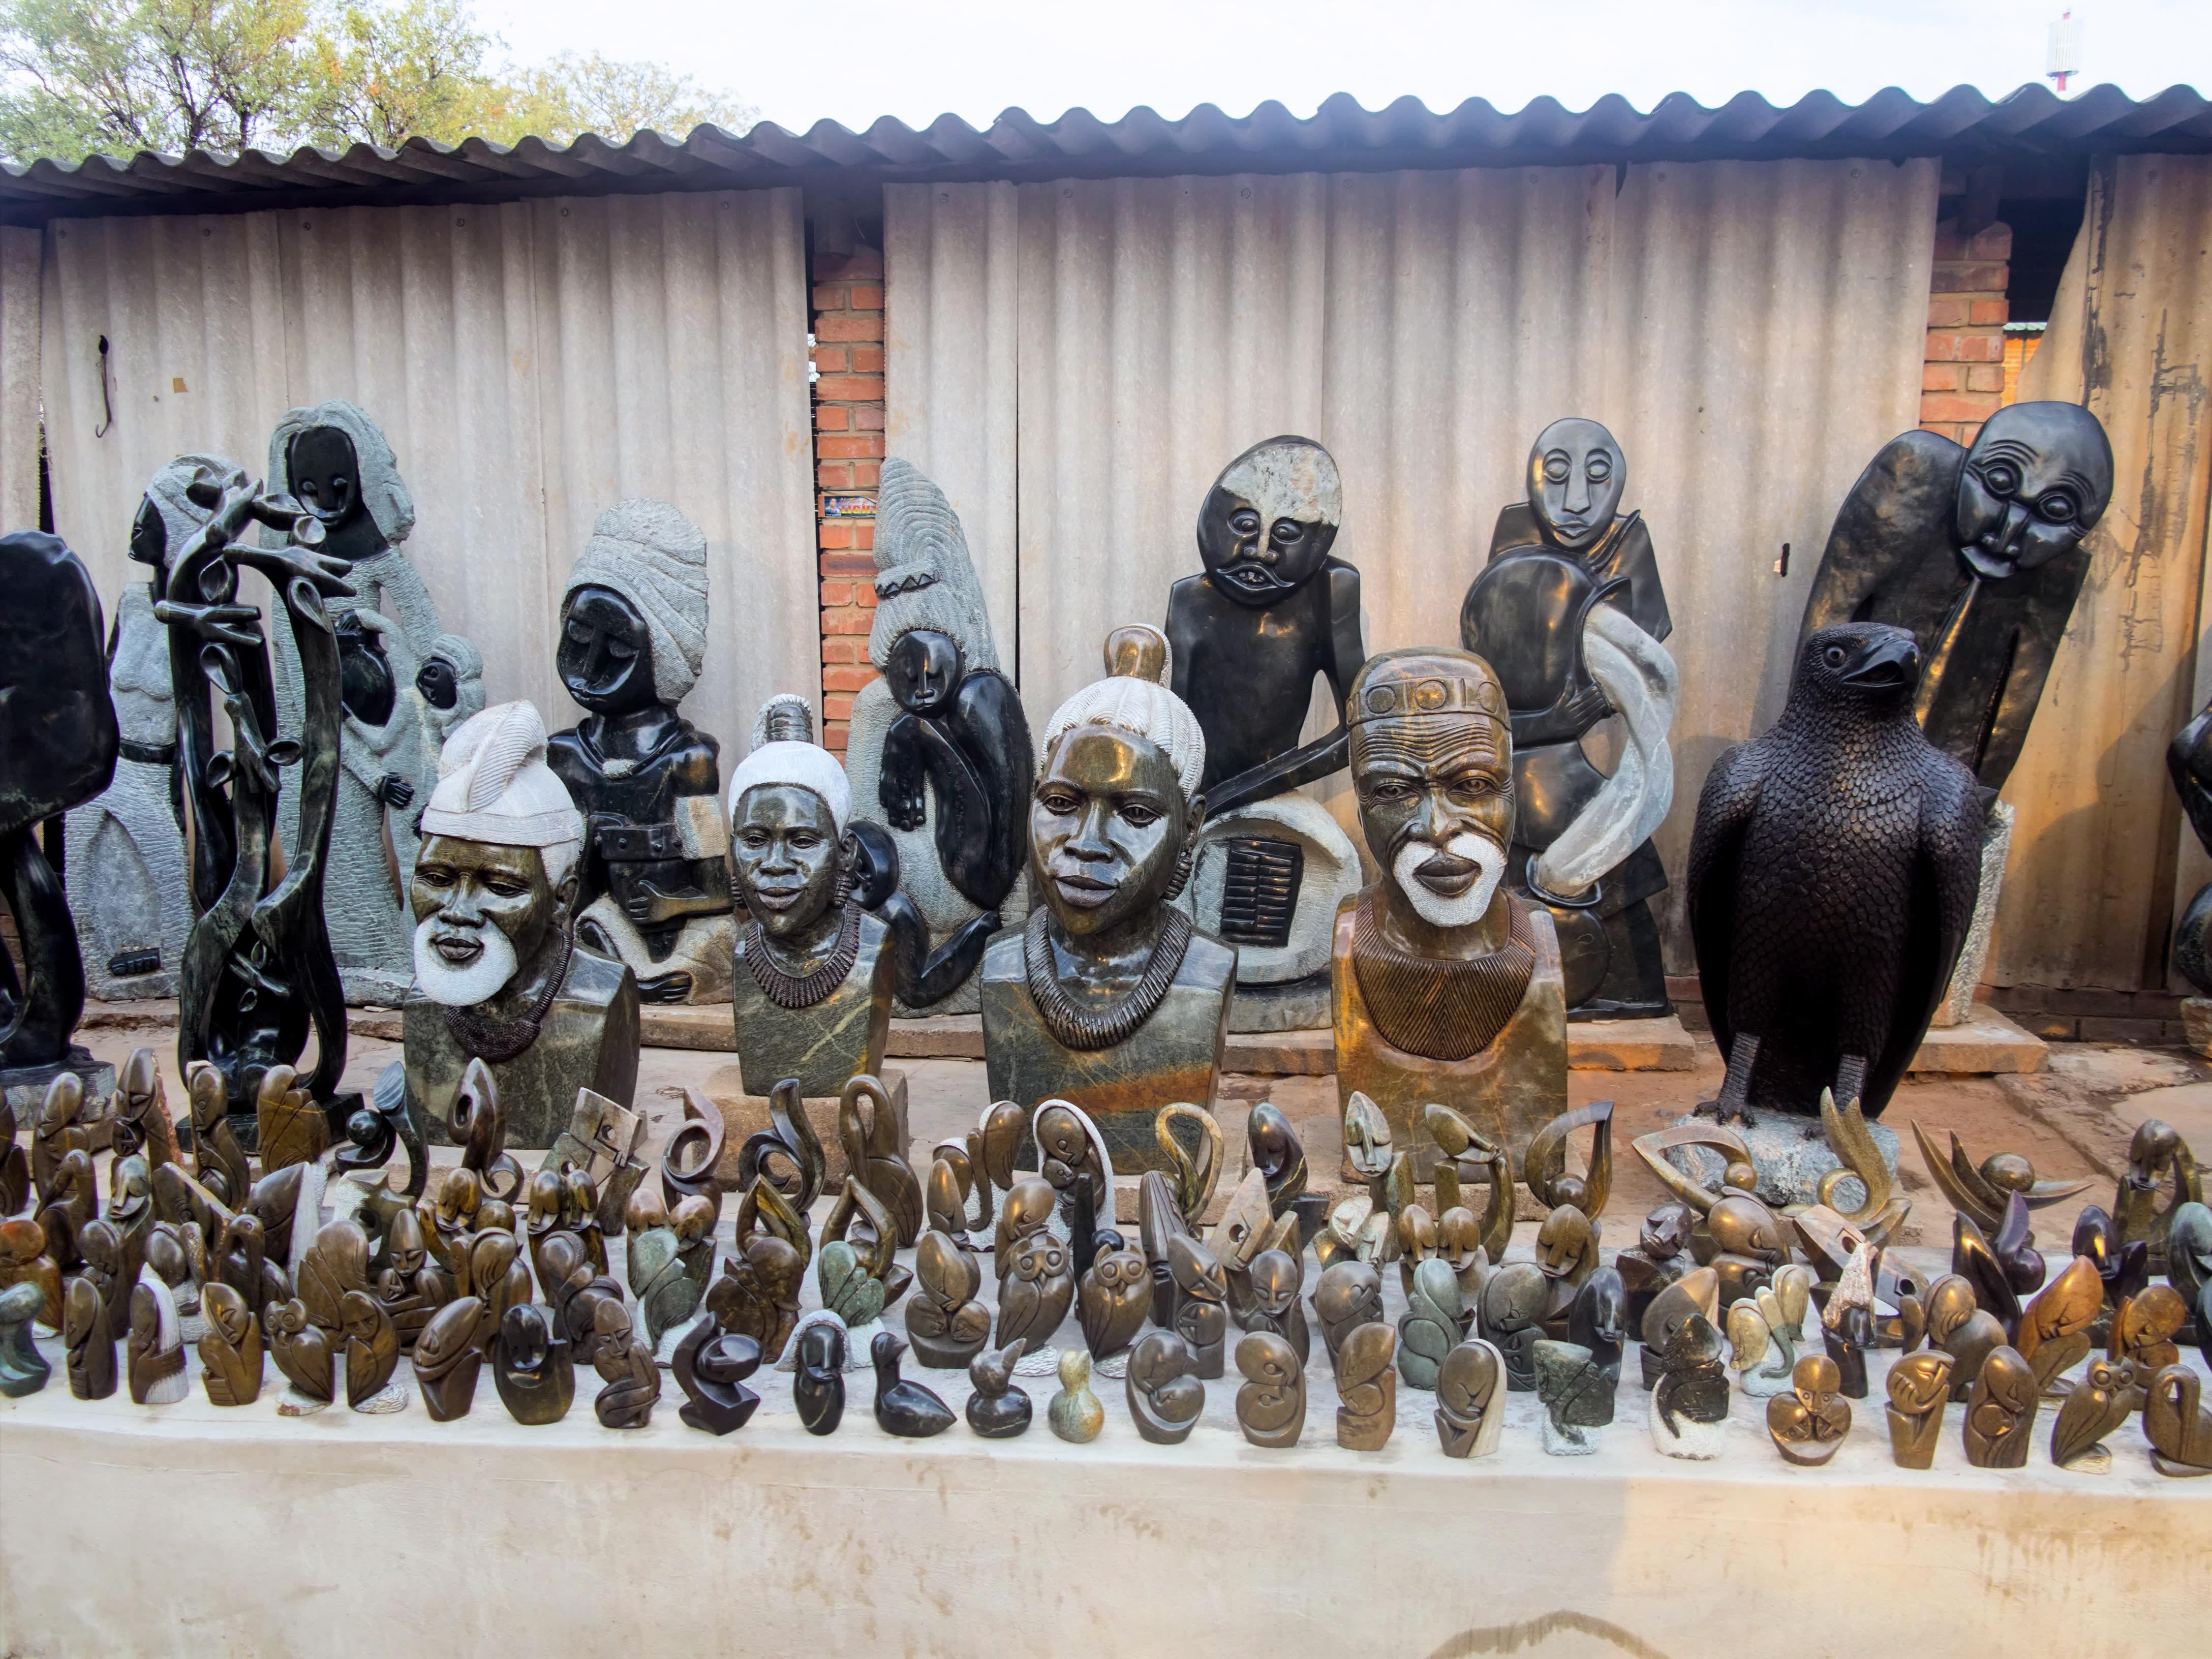 Bildhauer in Simbabwe